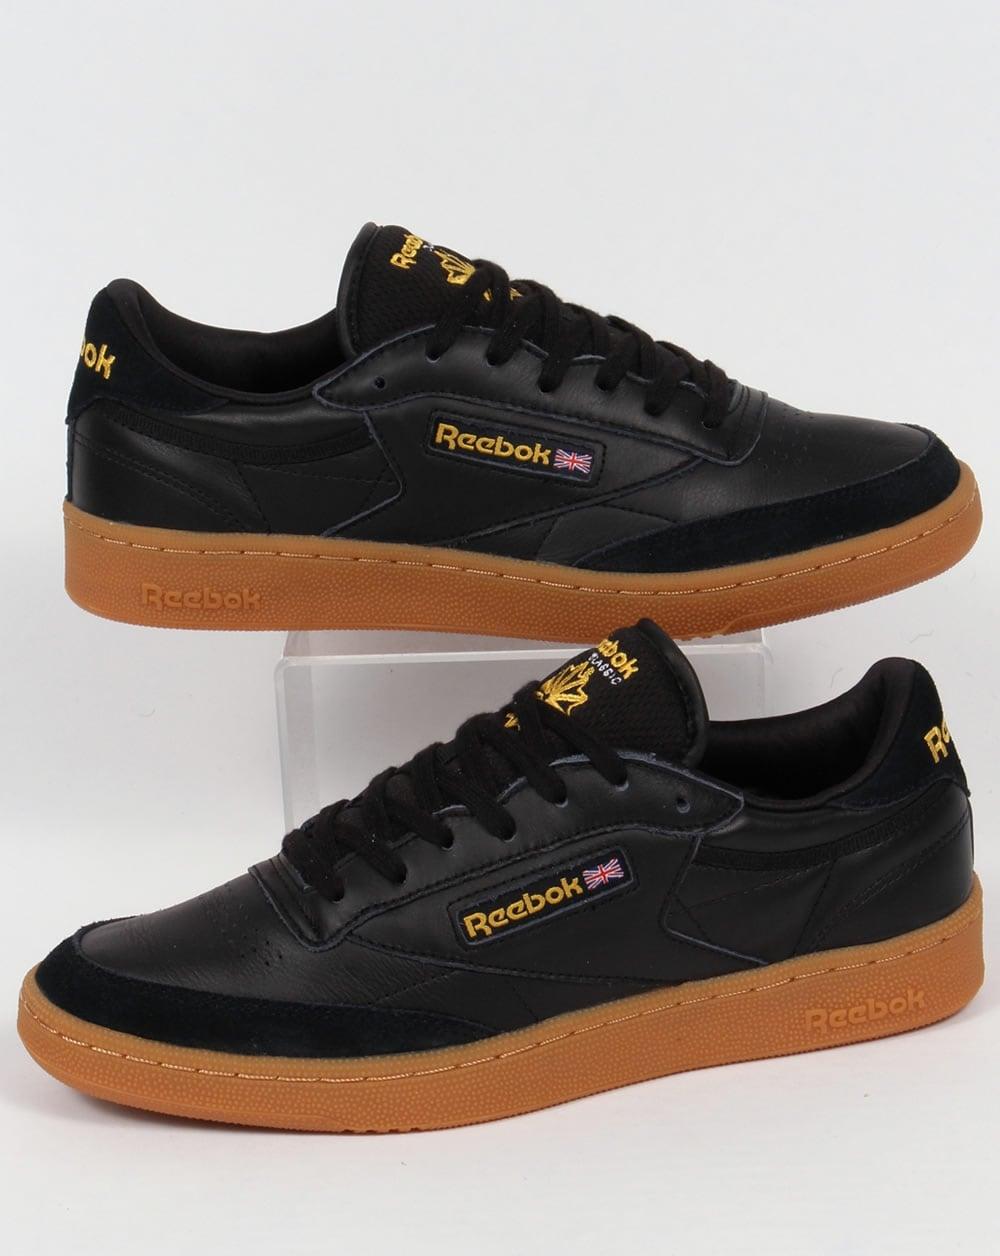 reebok club c 85 leather trainers